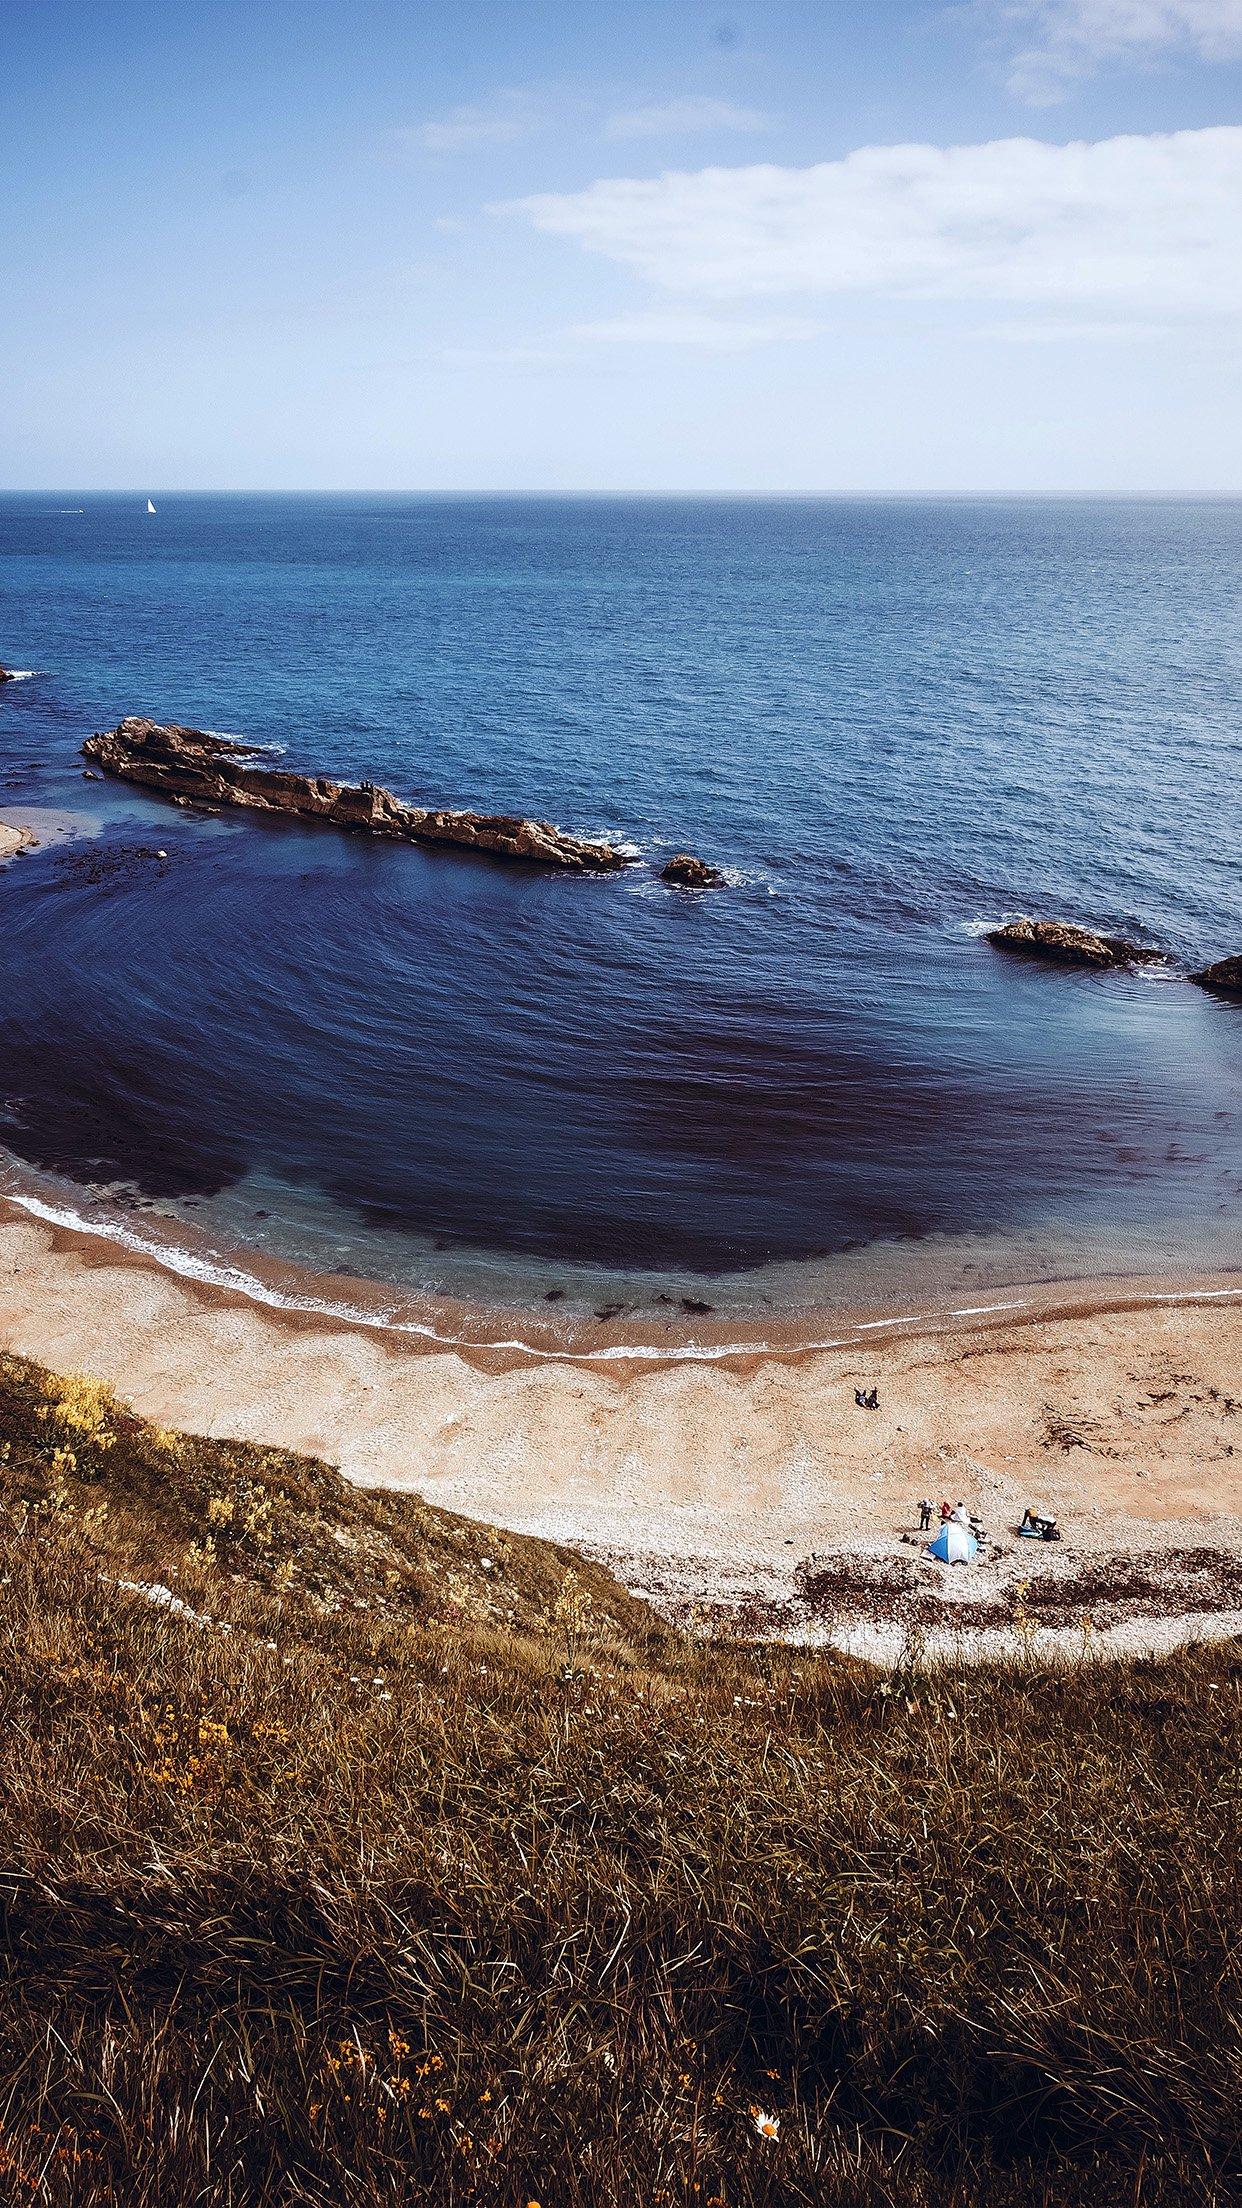 Cool Wallpaper Mountain Android - Nature-Camping-Sea-Beach-Ocean-Rock-Mountain-Color  Collection_212276.jpg